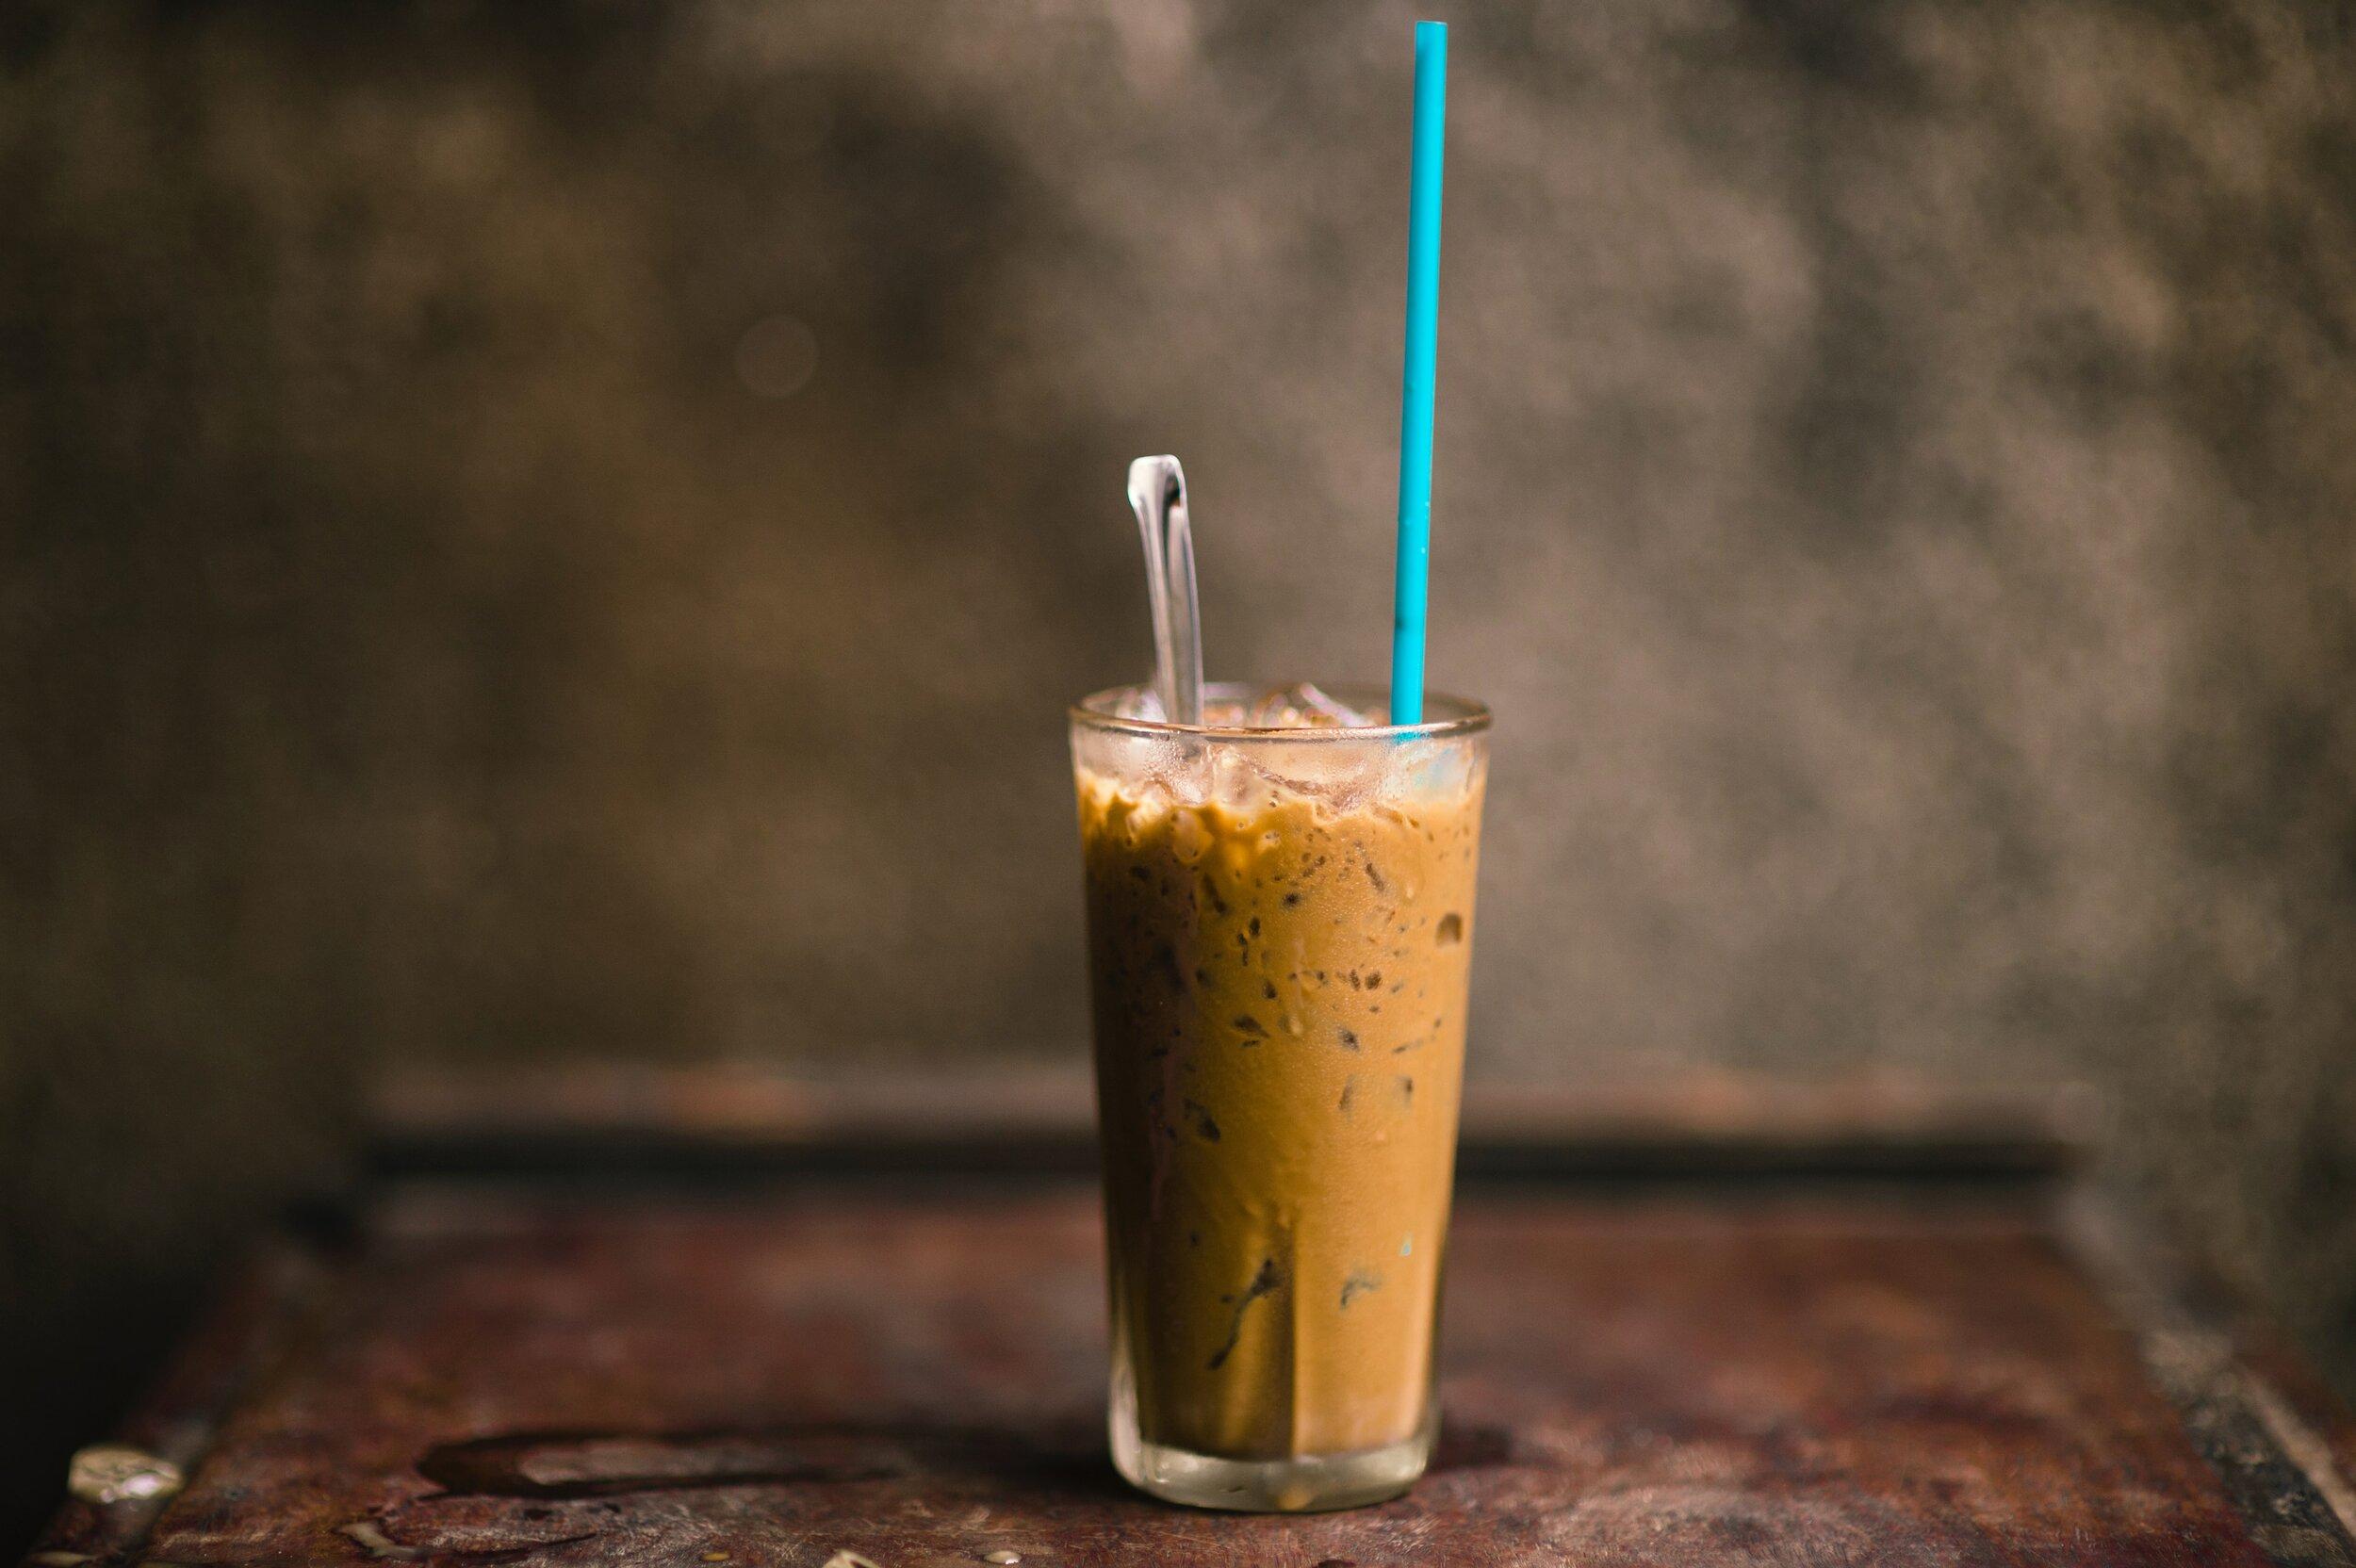 Iced Latte. photo credit: Frank Mckenna